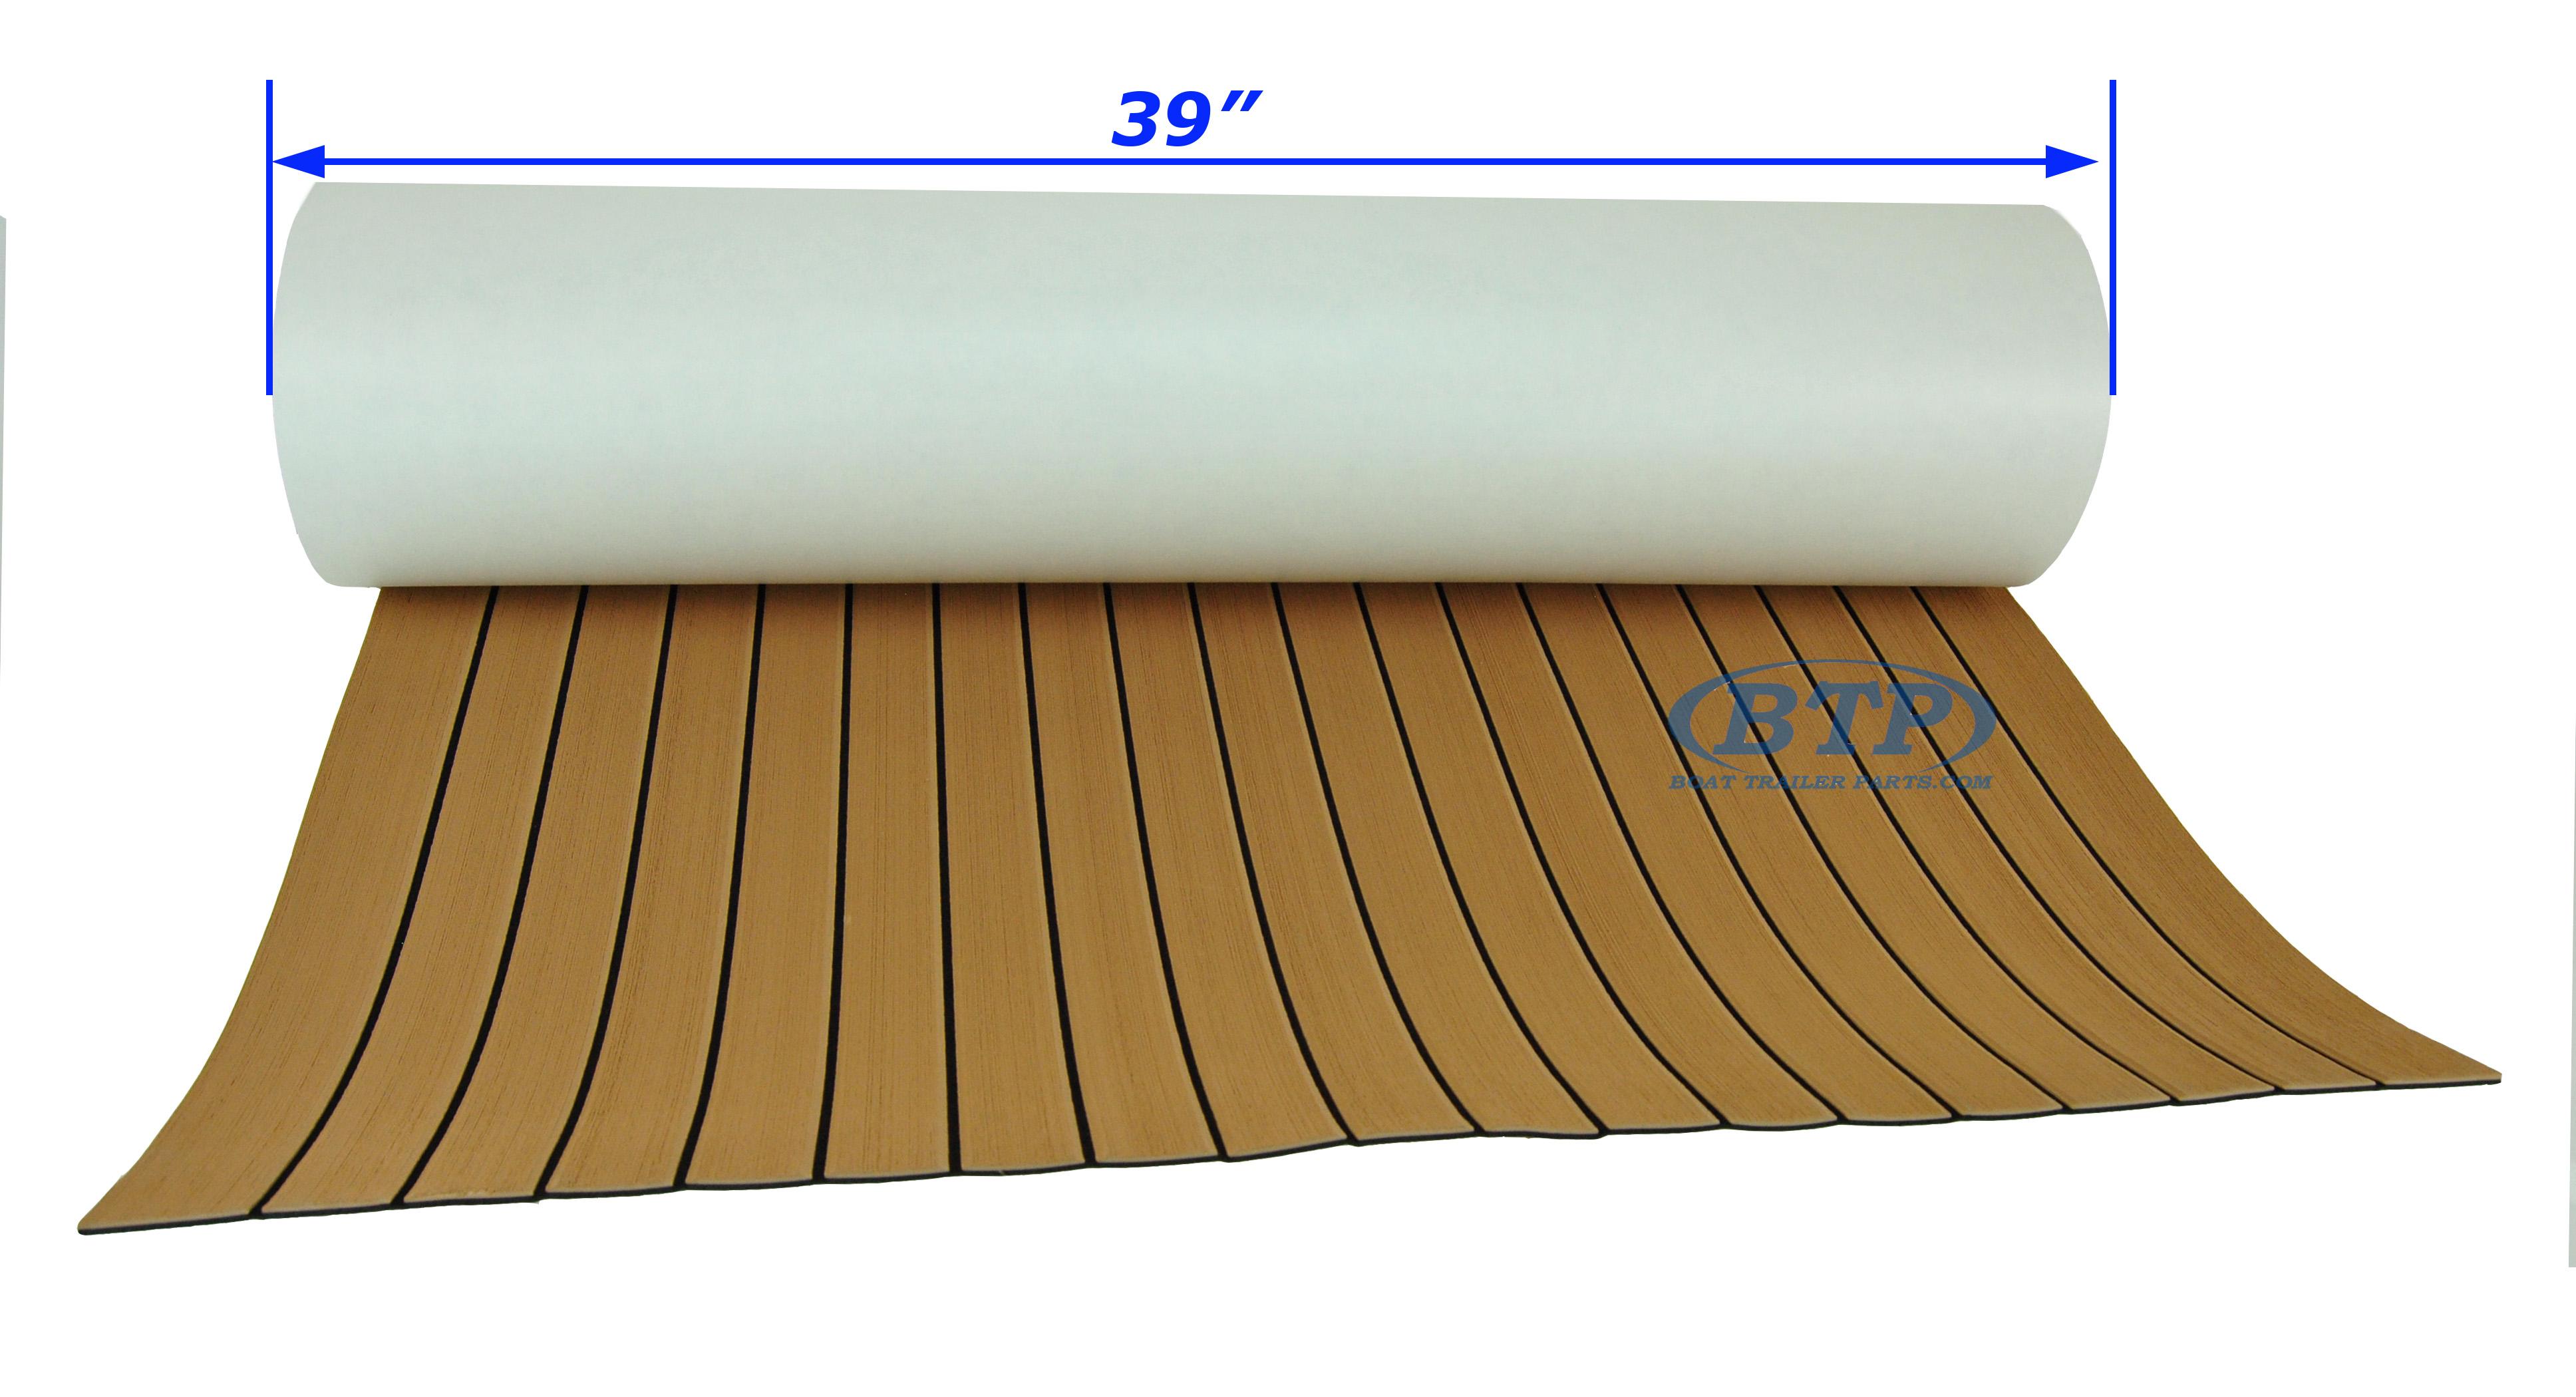 1 Inch Thick Foam Flooring